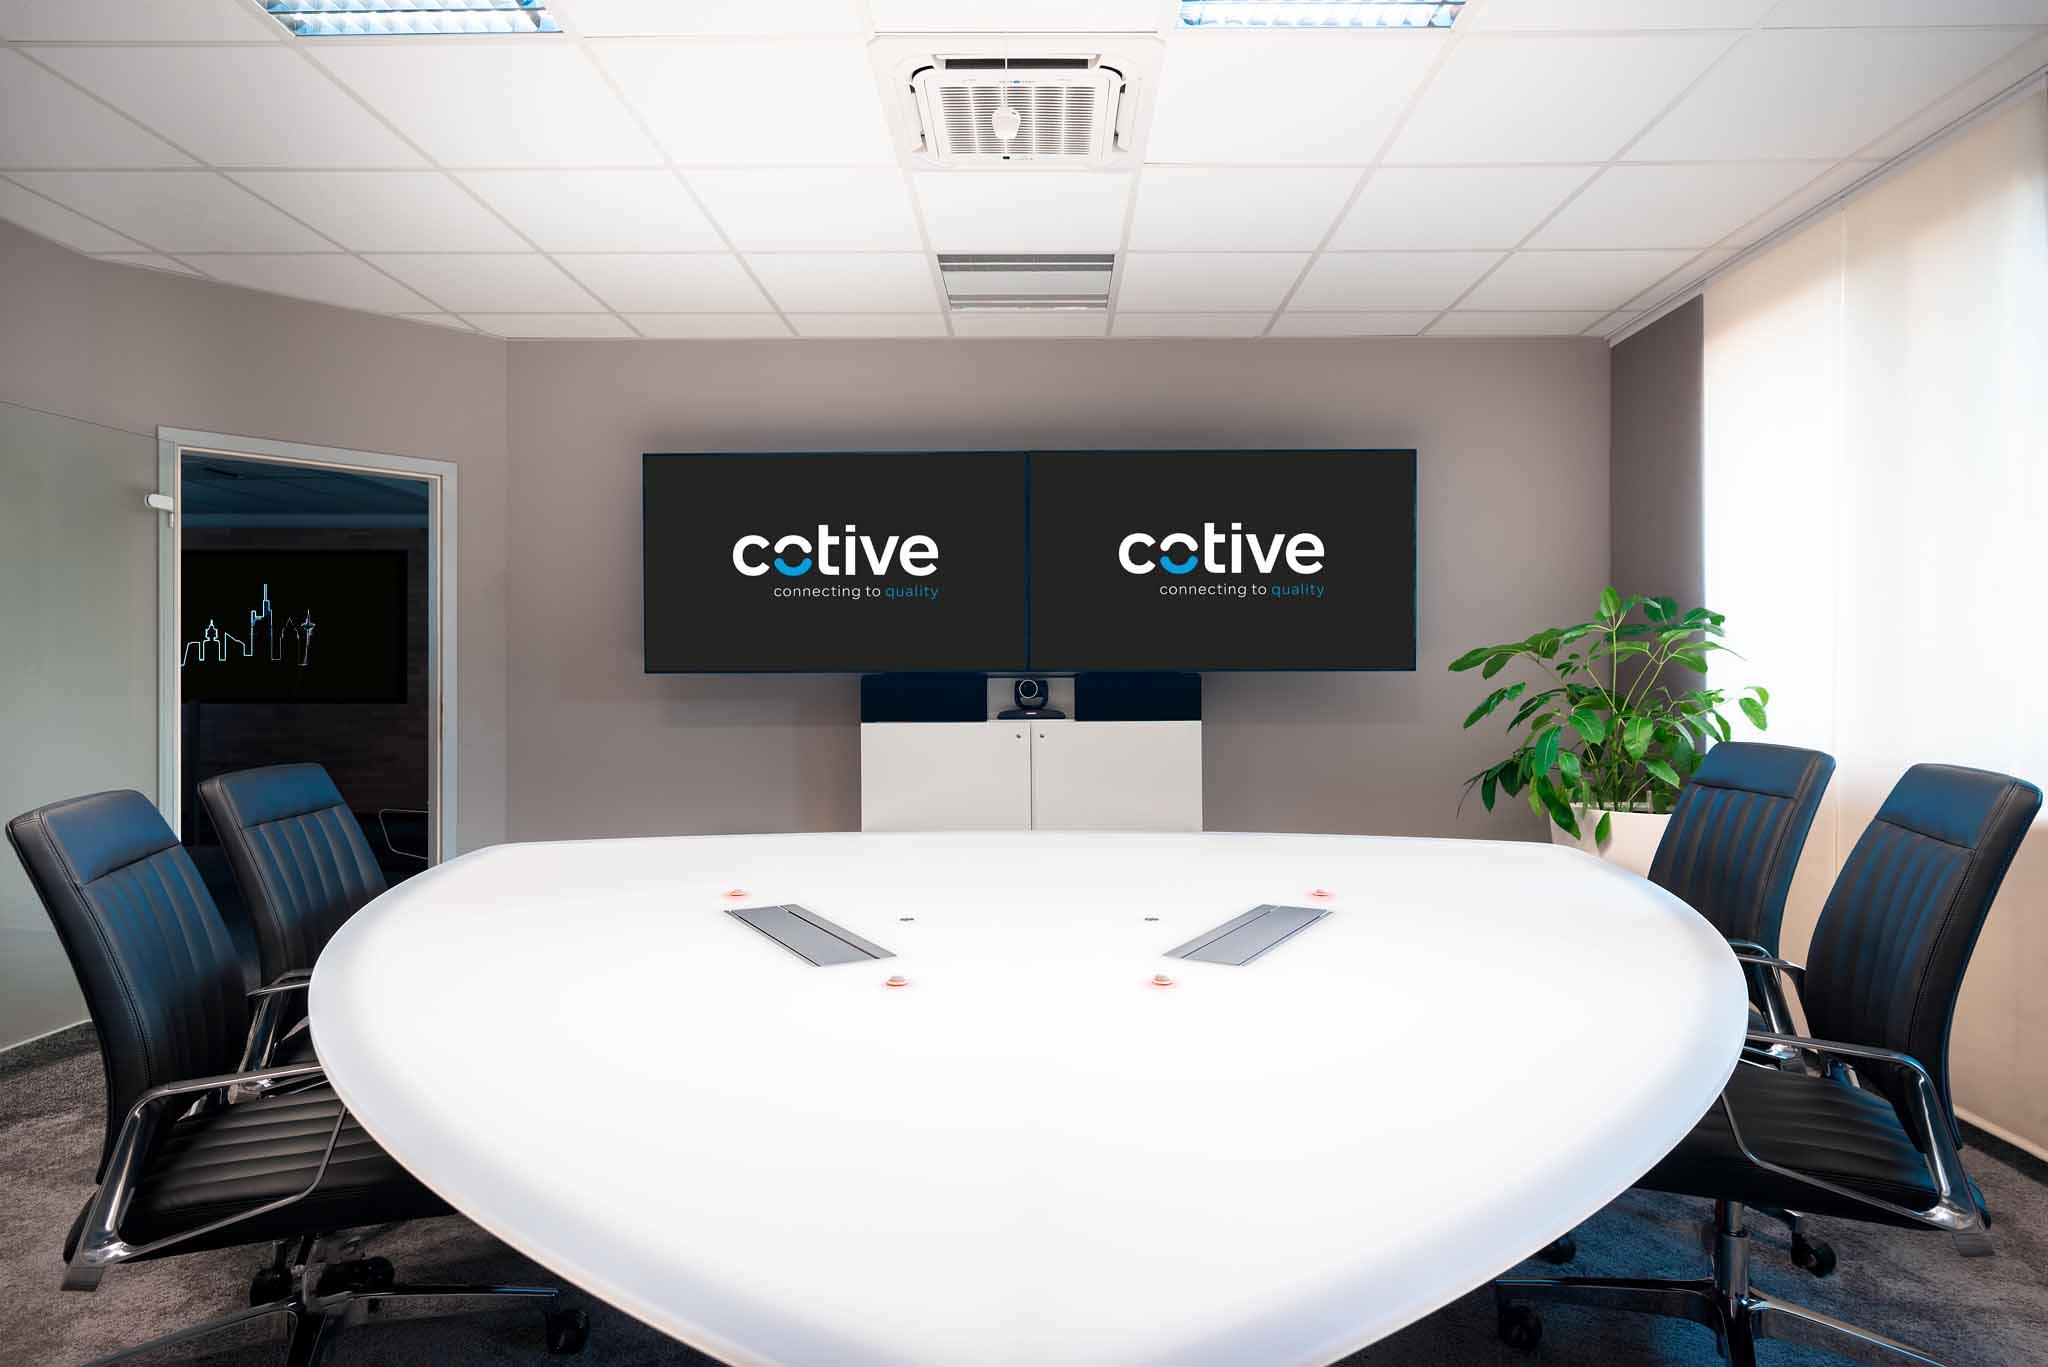 cotive-konferenzraum-1